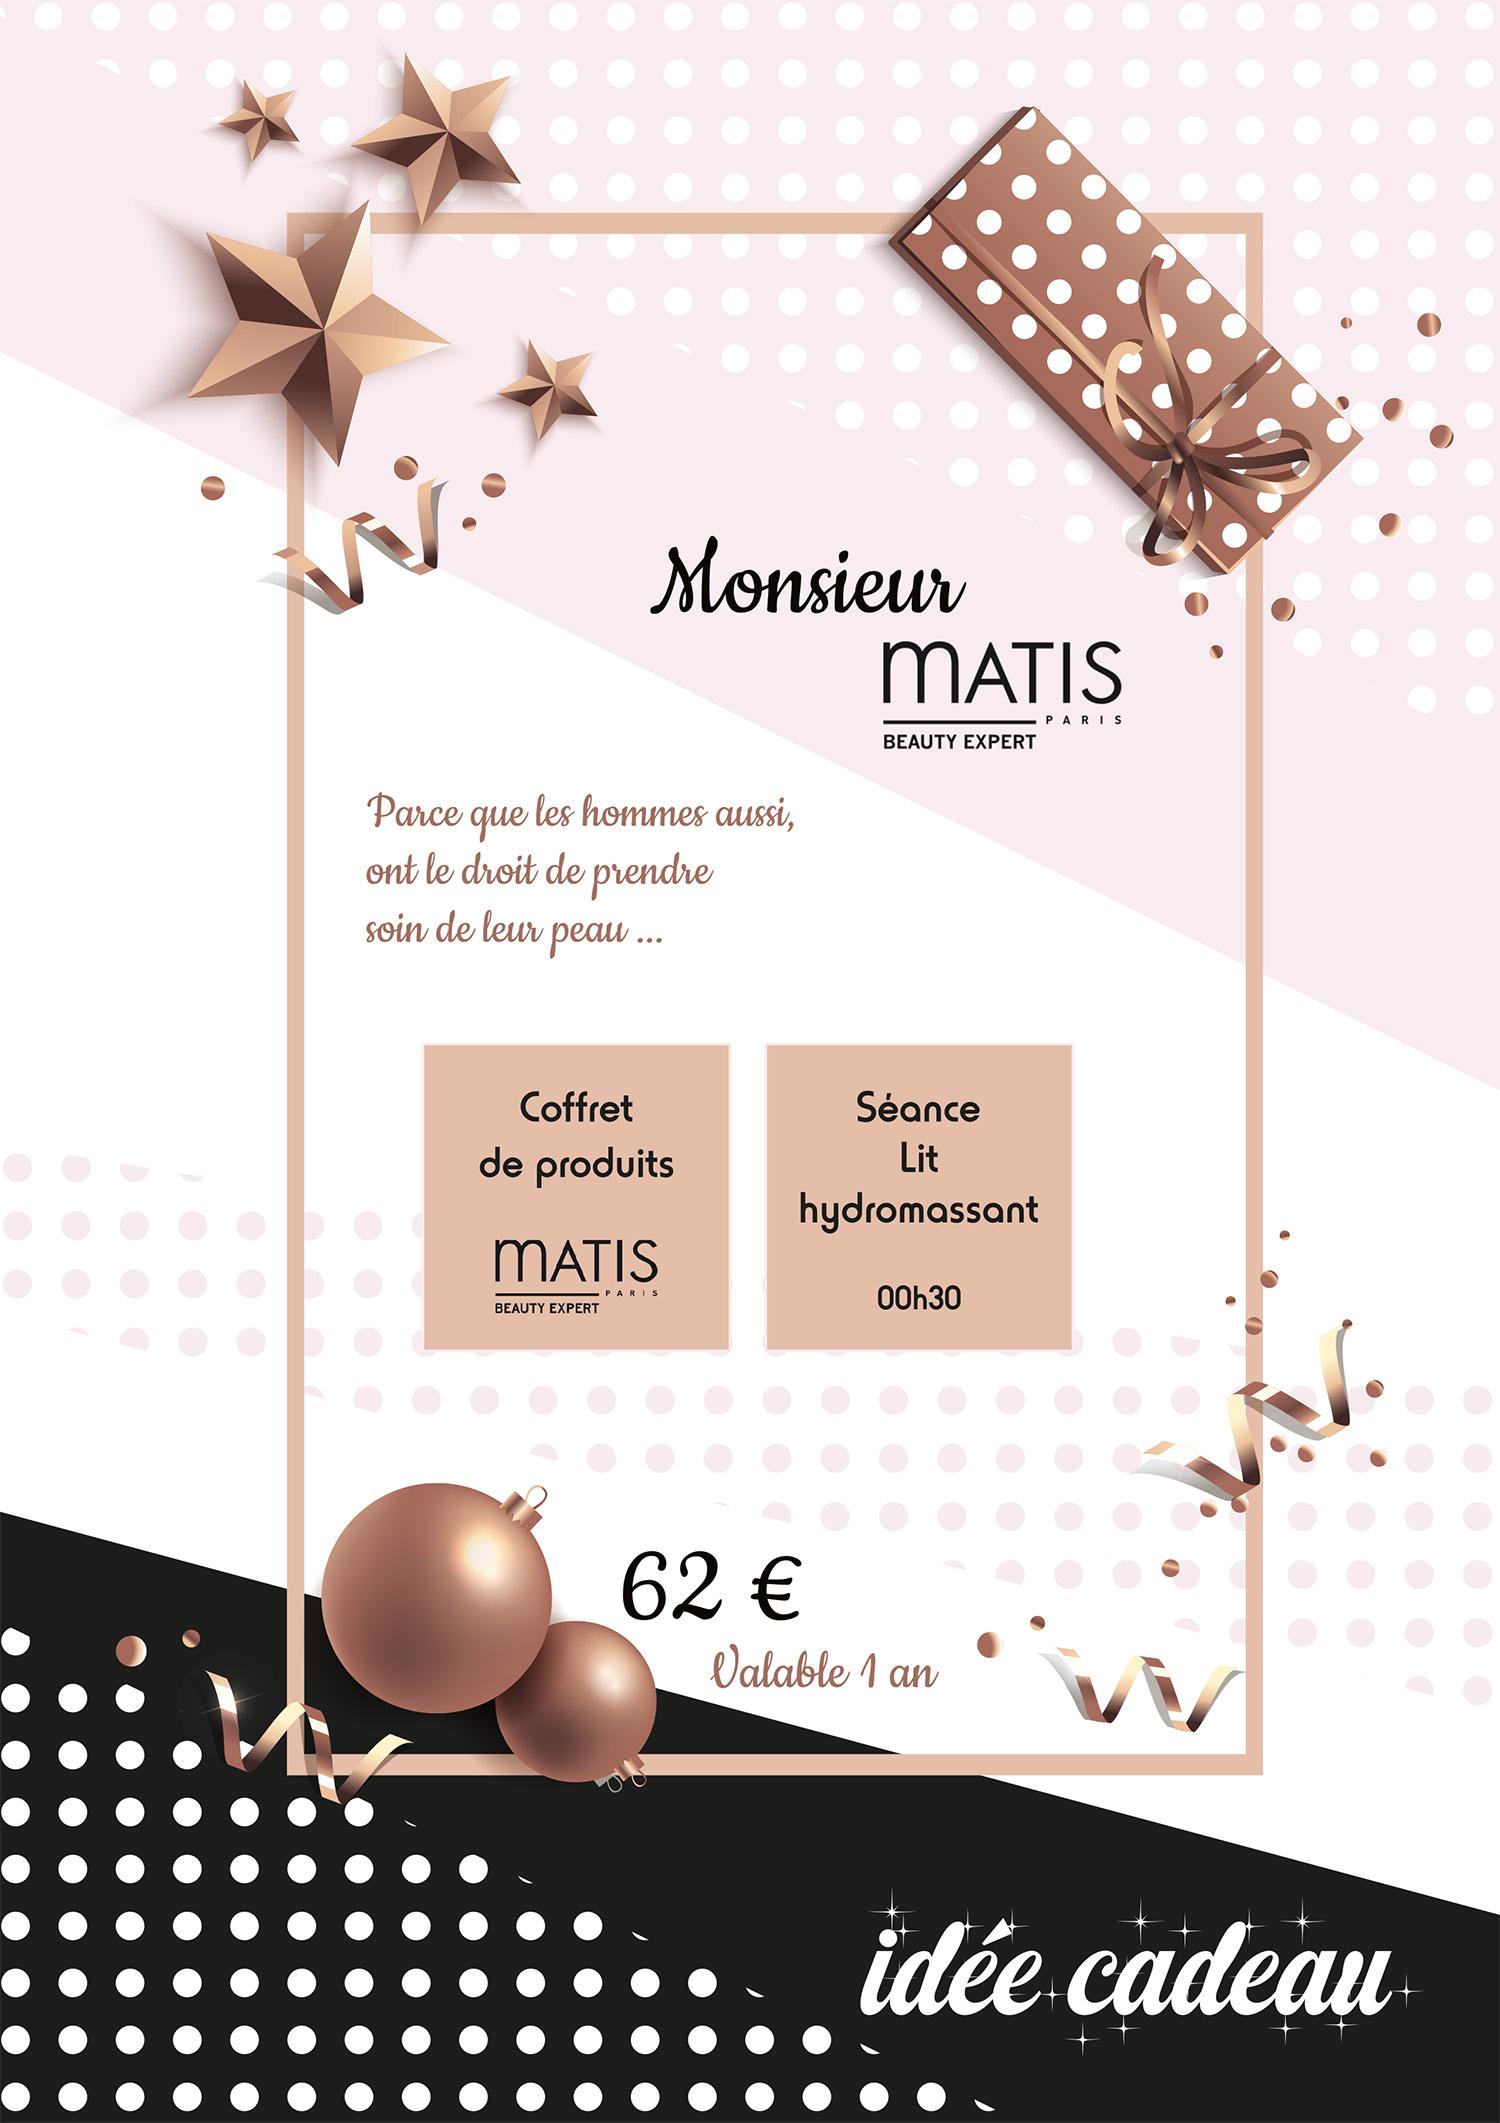 Monsieur MATIS